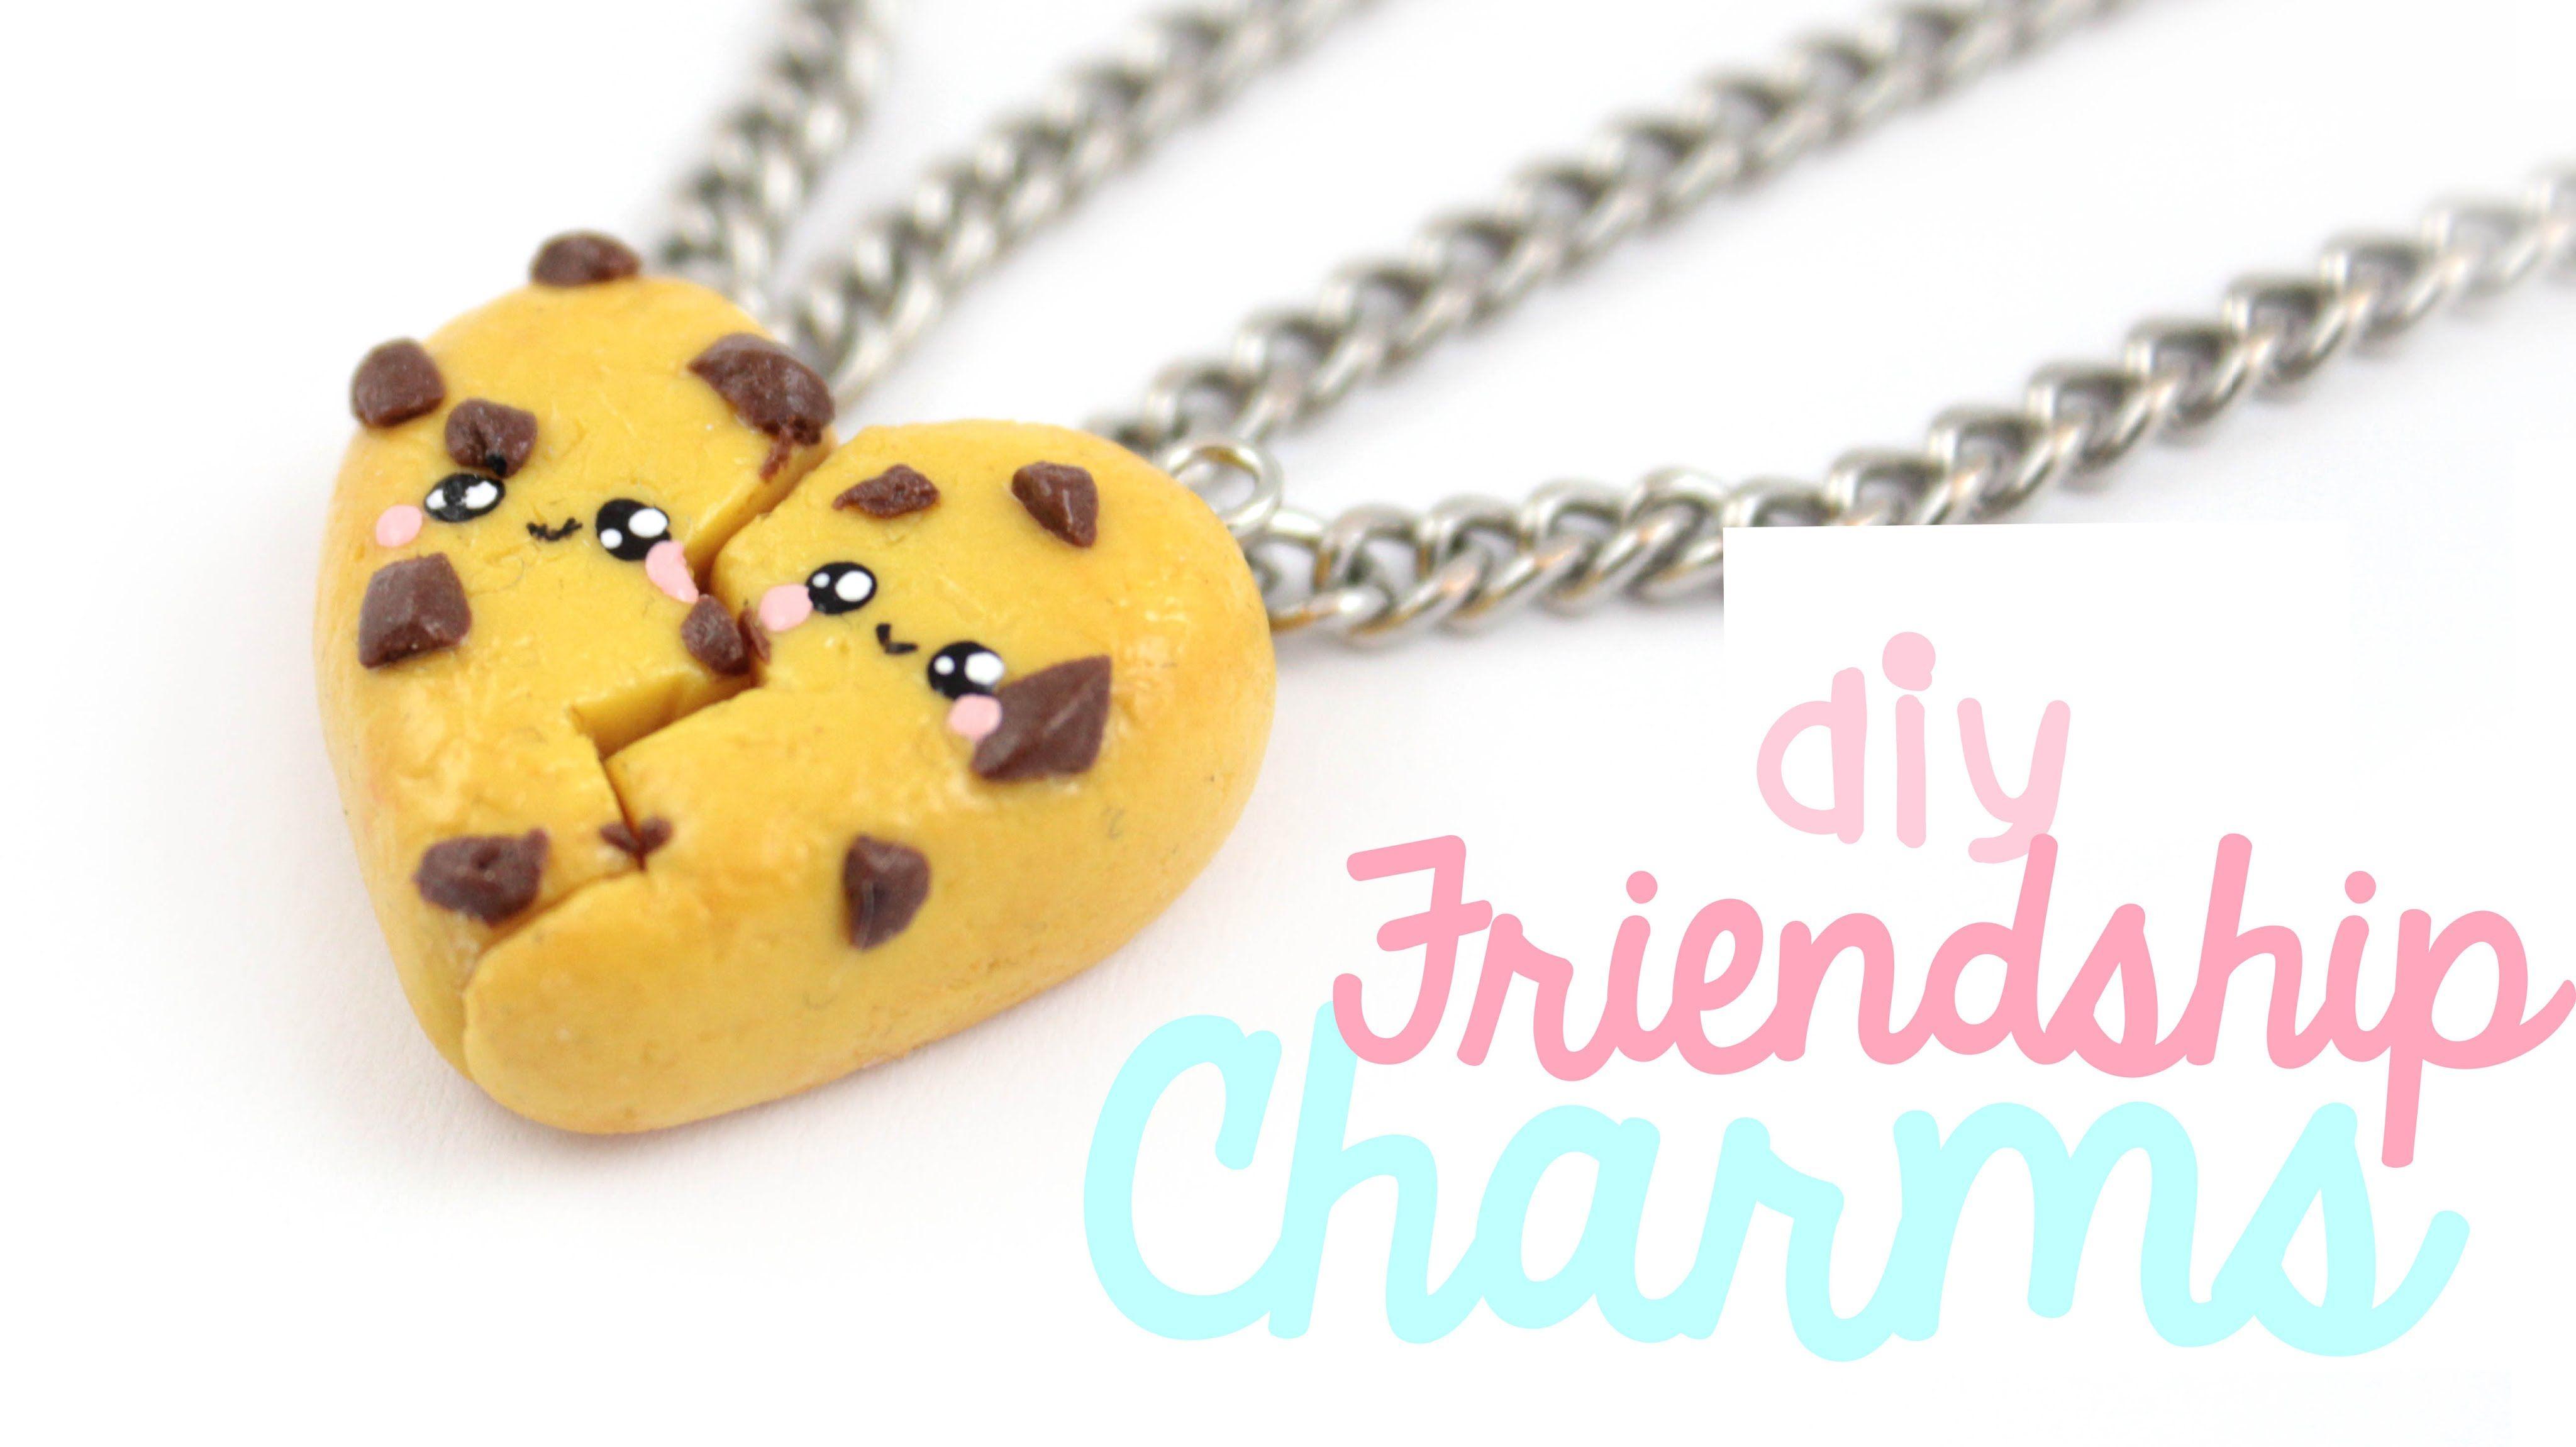 DIY Cute Cookie Friendship Charms Polymer Clay Tutorial | Kawaii ...